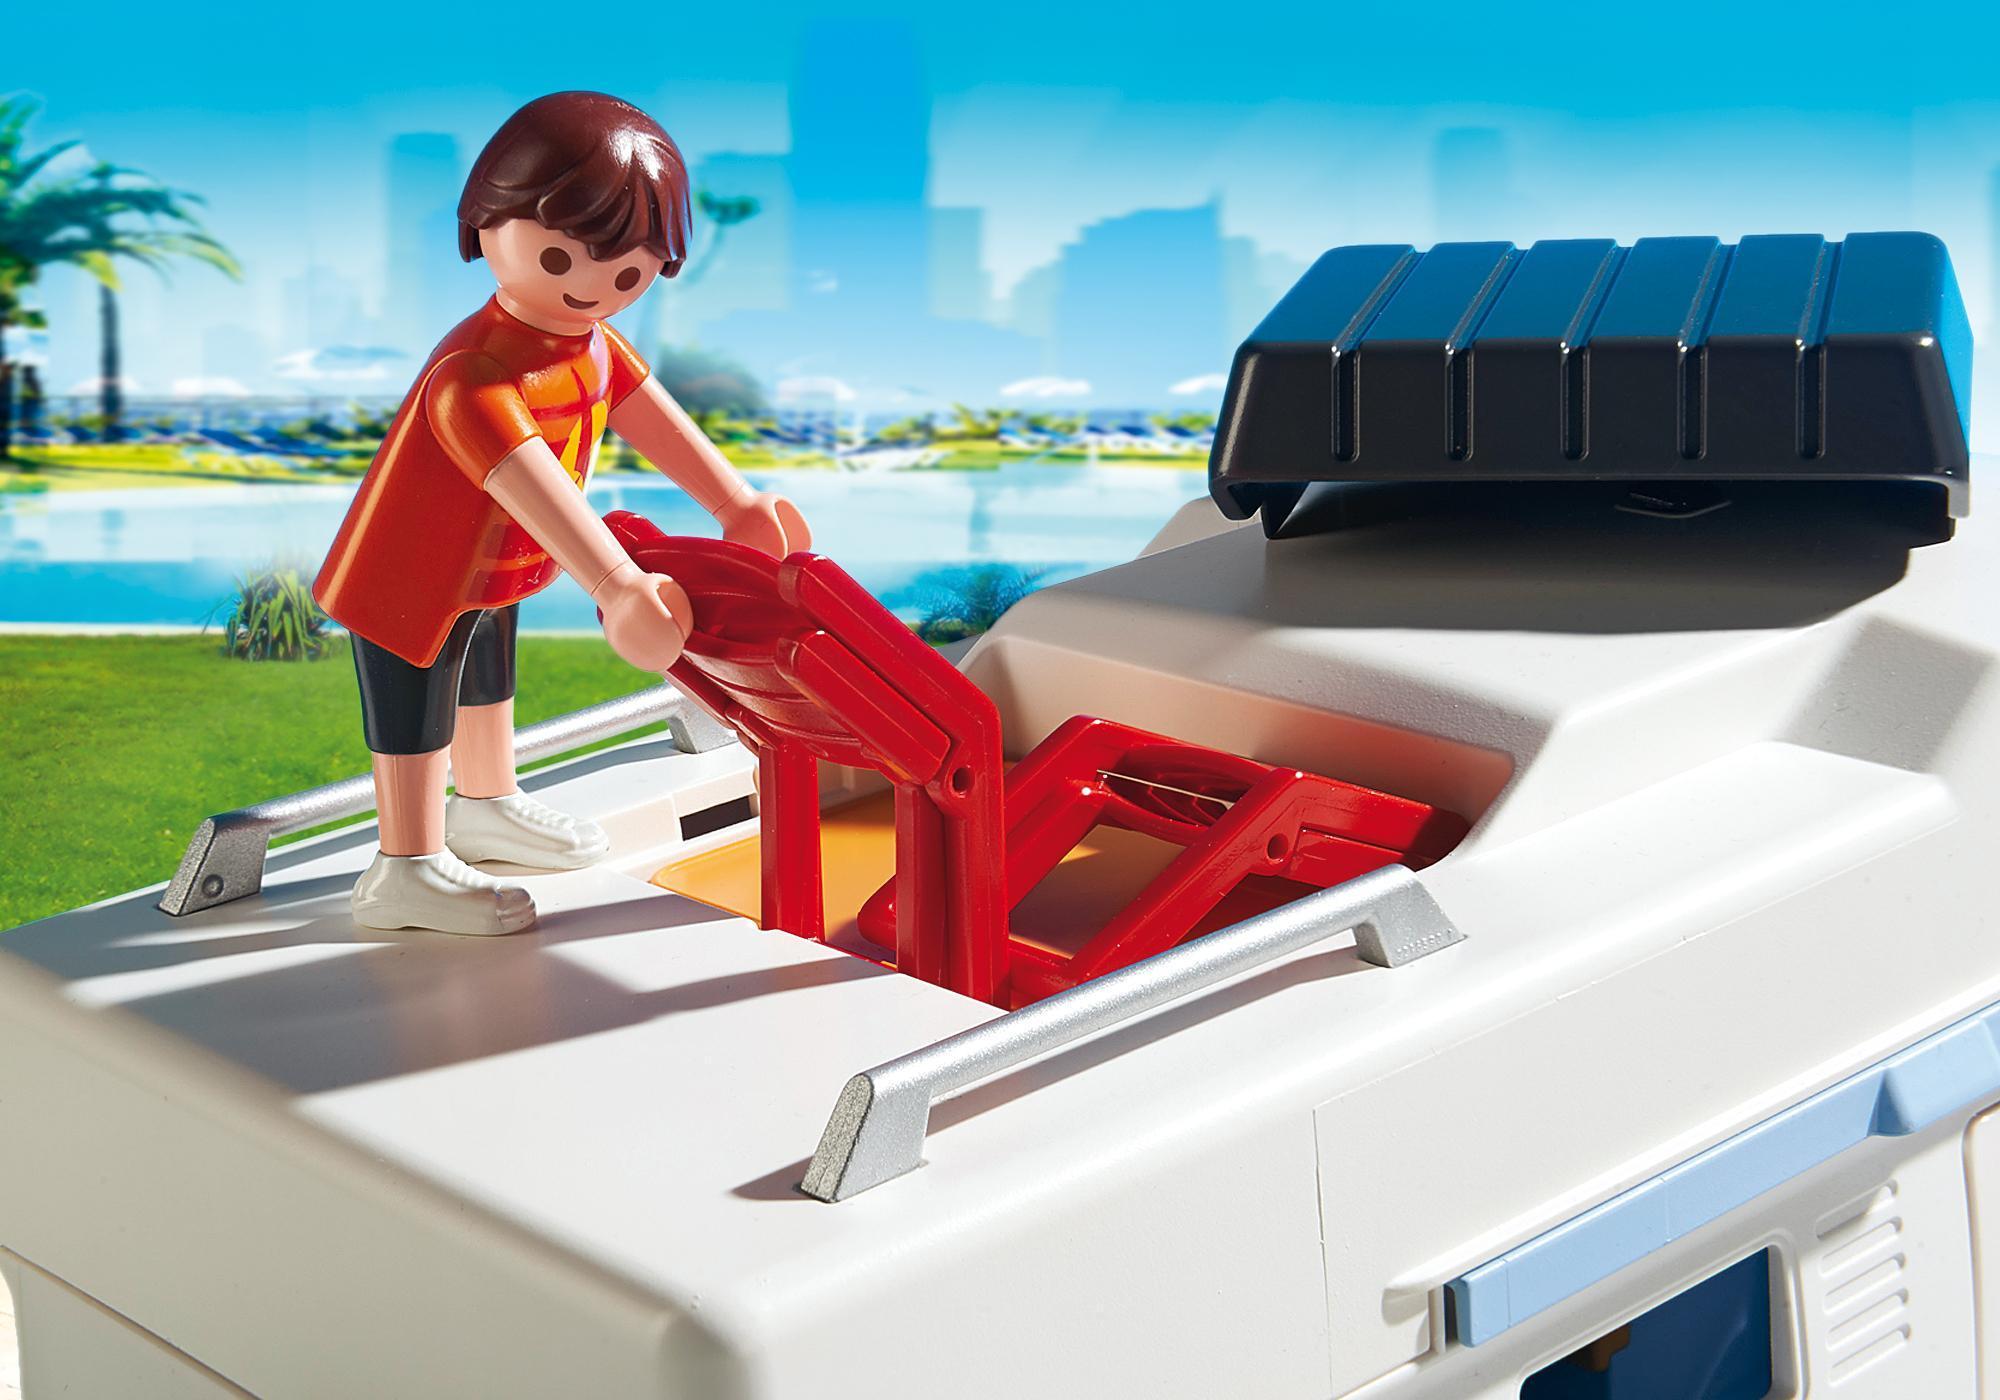 http://media.playmobil.com/i/playmobil/6671_product_extra2